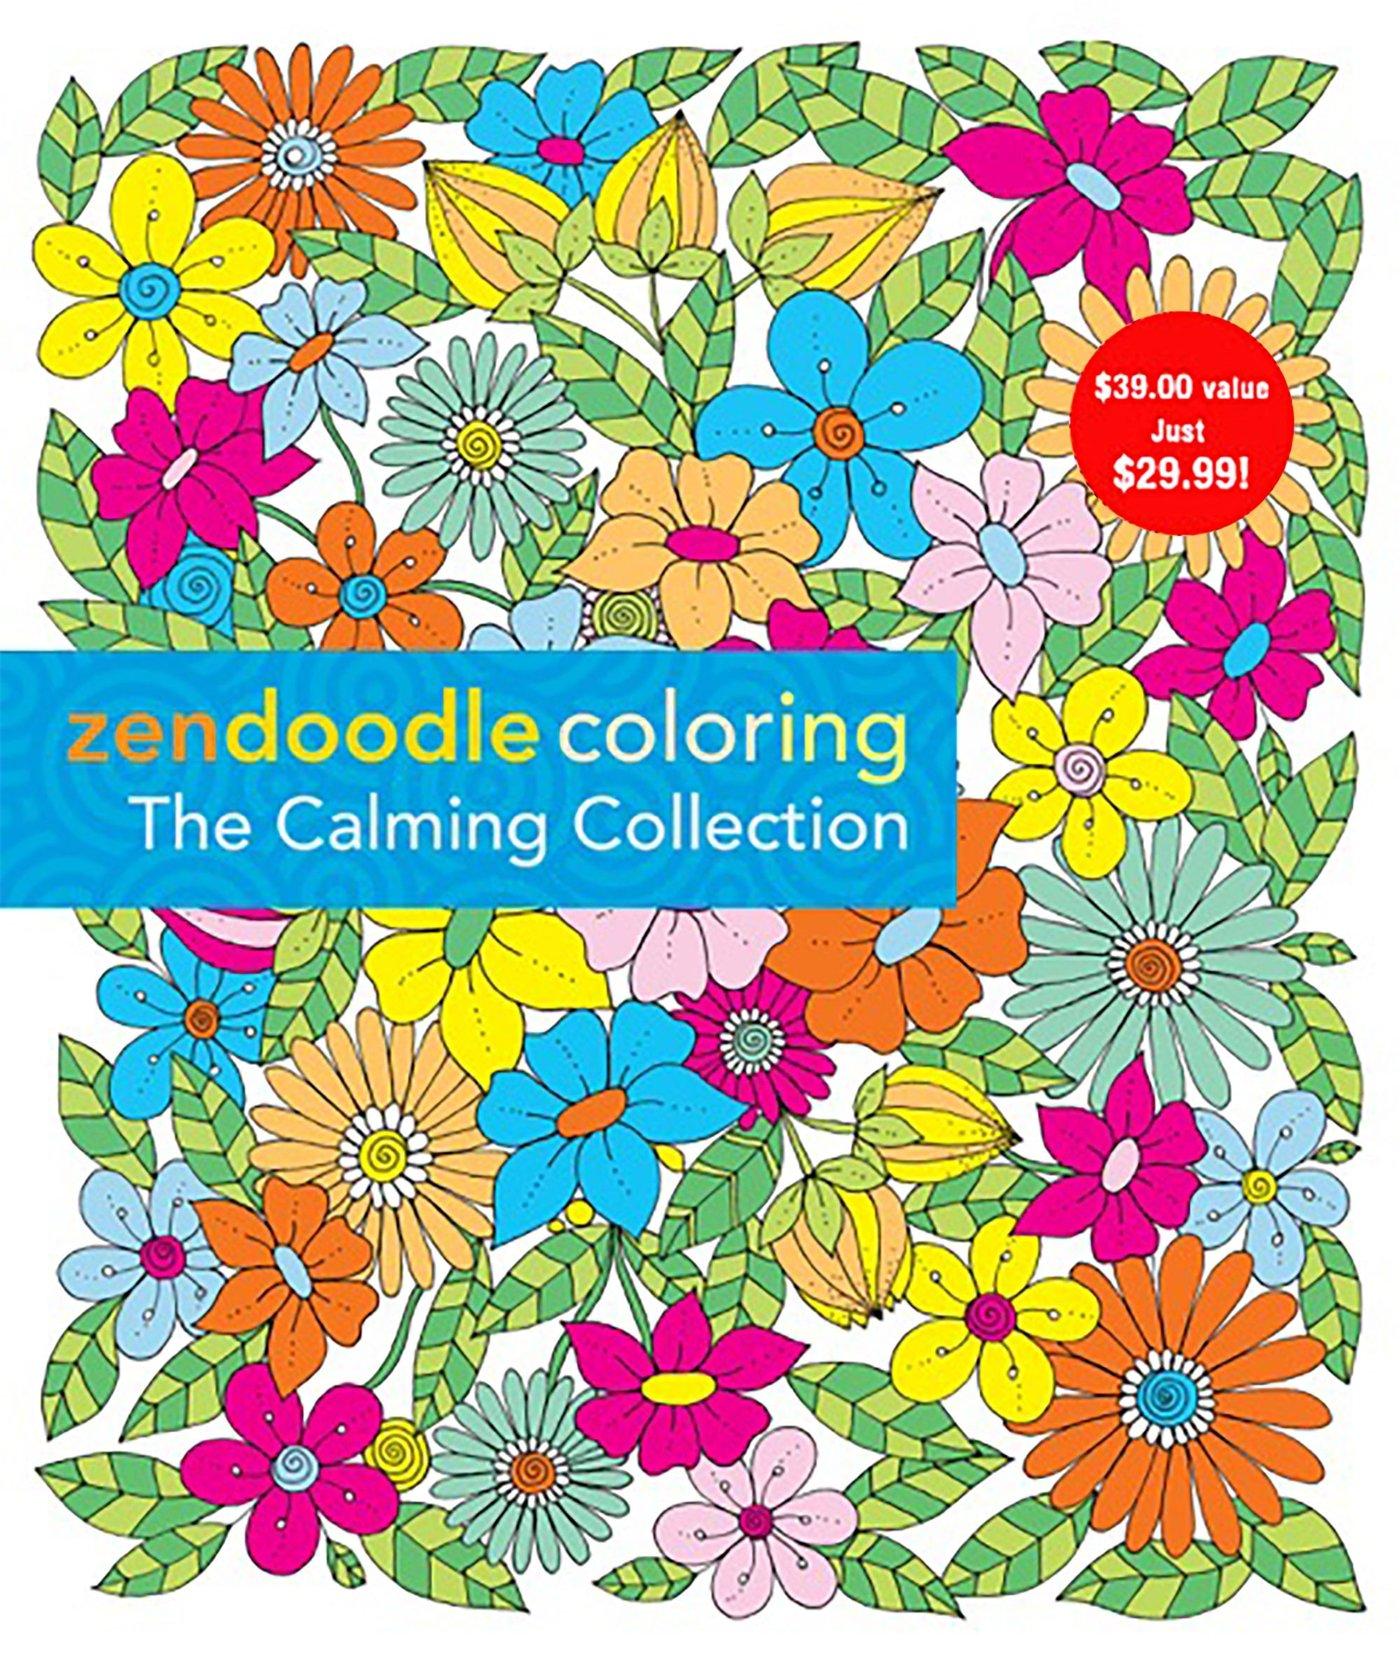 Zendoodle coloring enchanting gardens - Amazon Com Zendoodle Calming Collection Box Set Enchanting Gardens Calming Swirls And Uplifting Inspirations Zendoodle Coloring 9781250132024